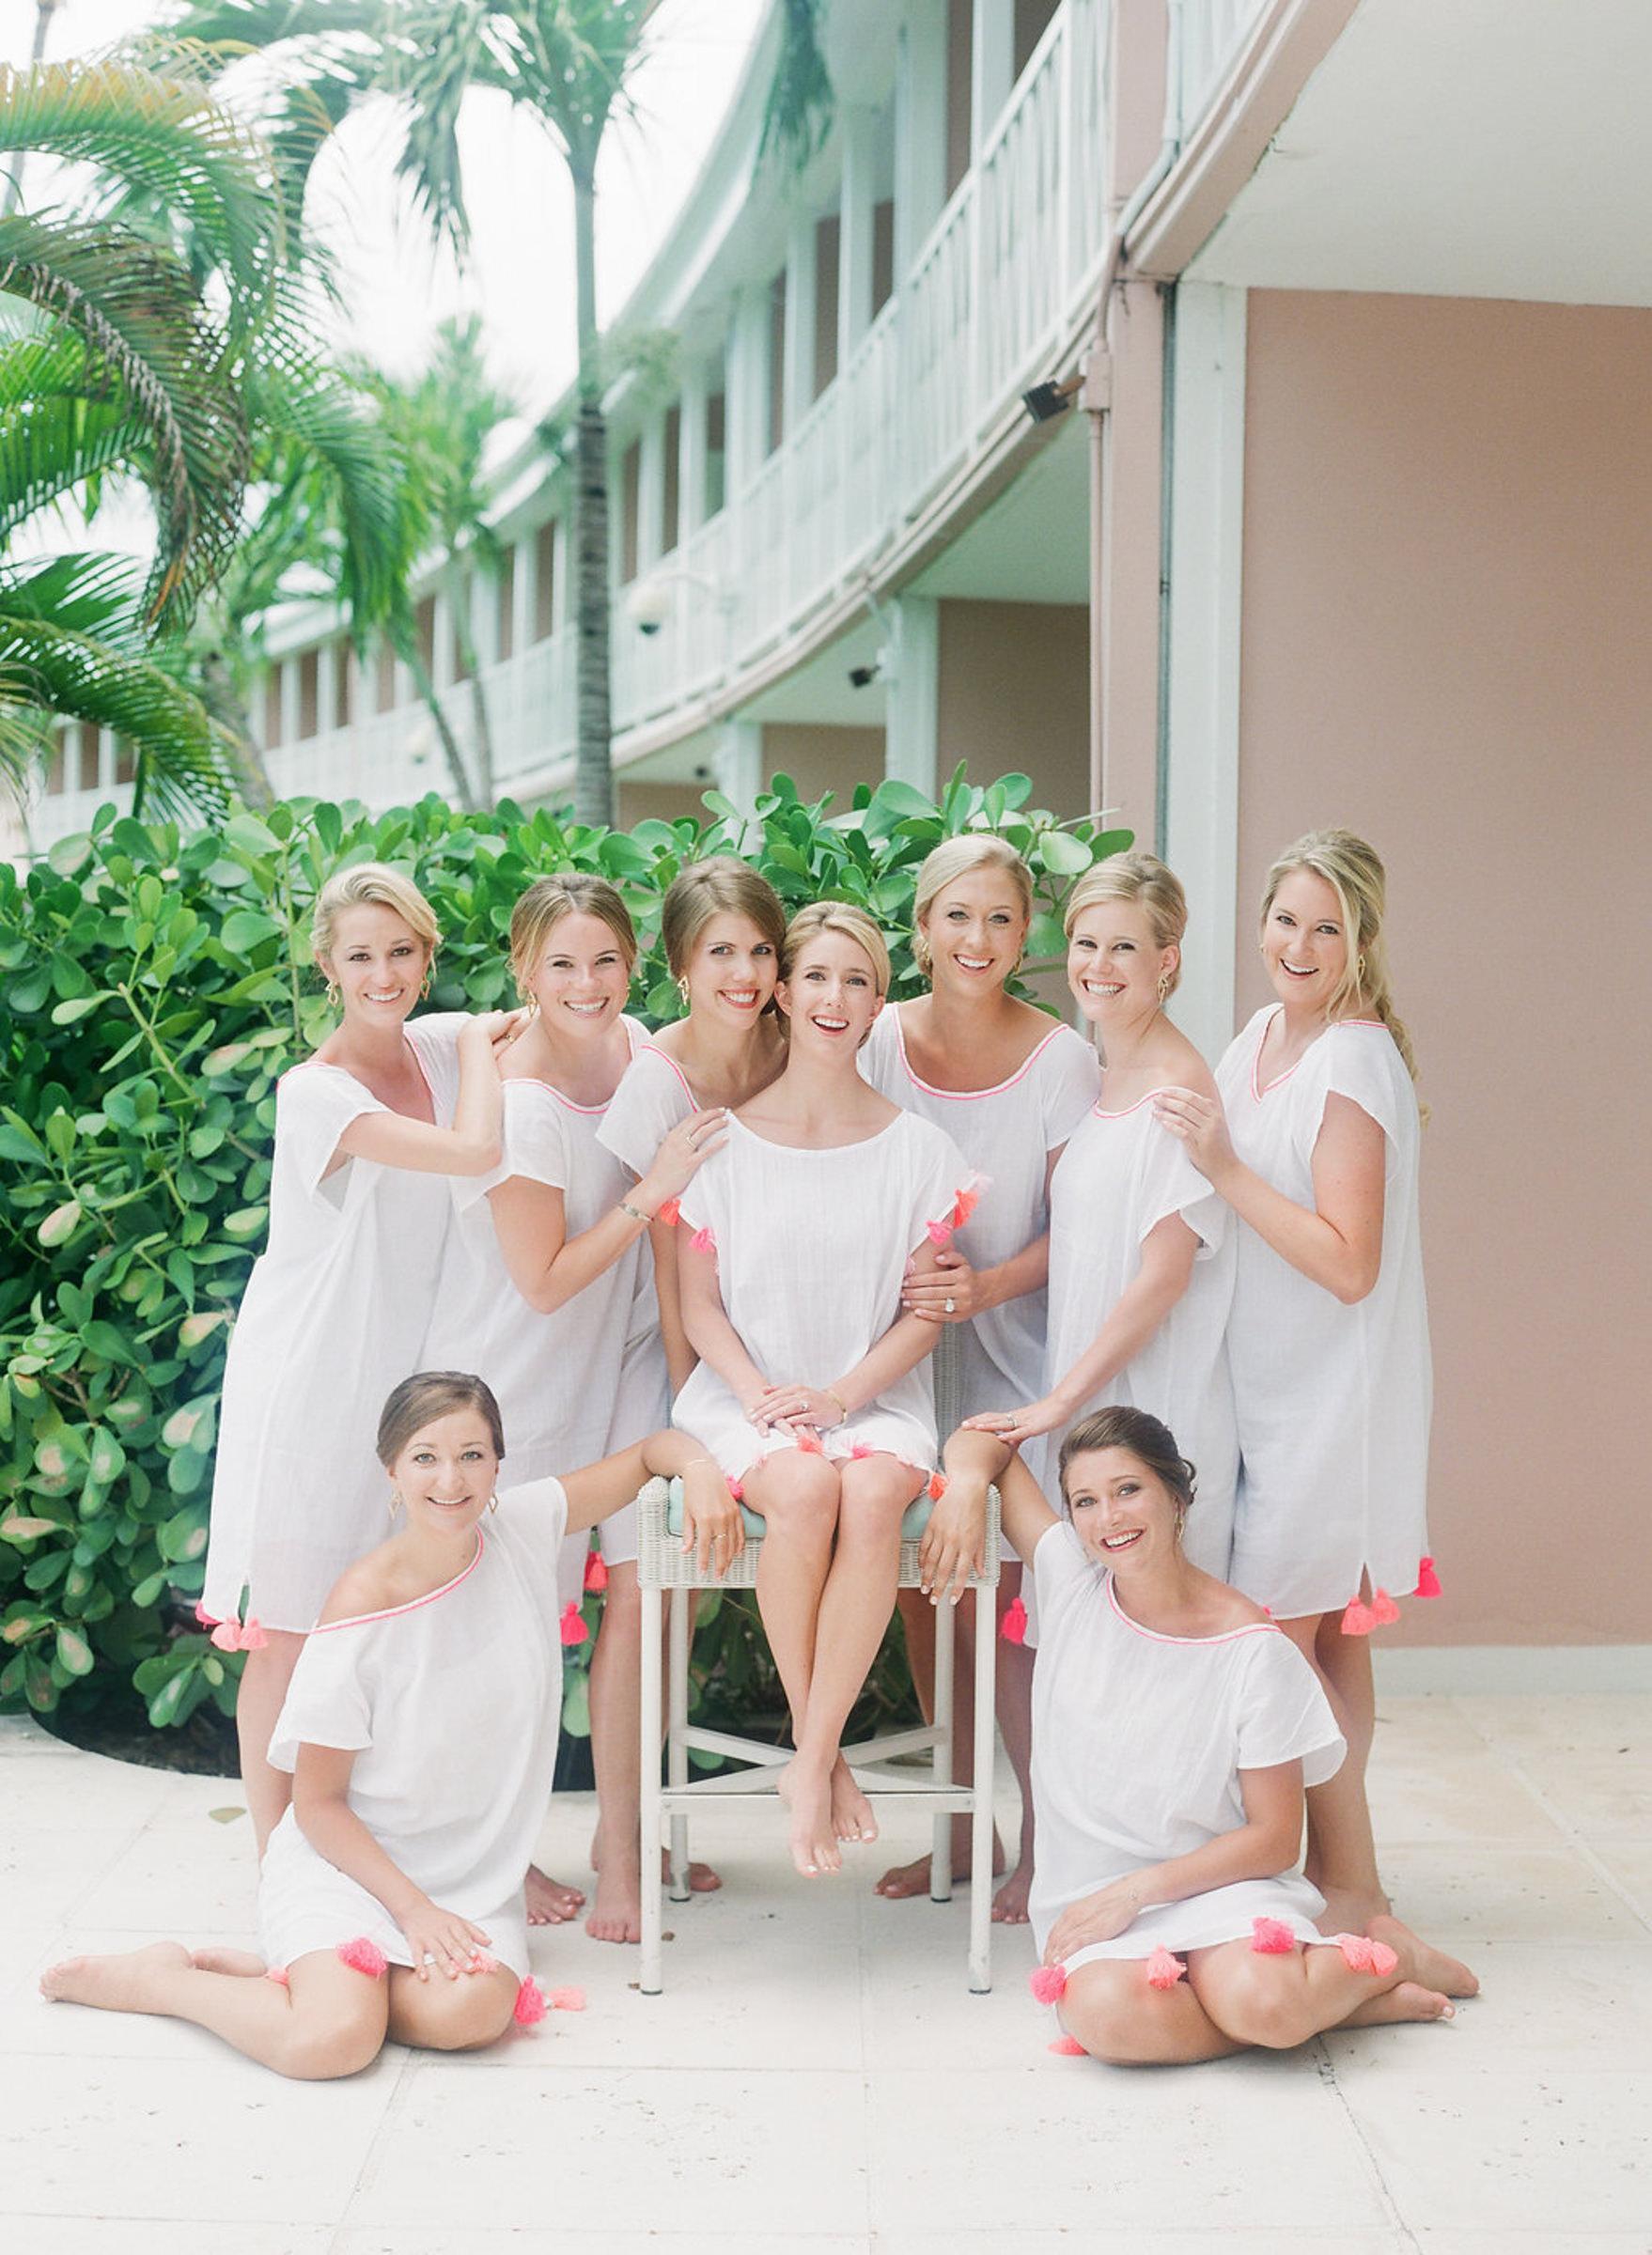 Group portrait of bridesmaid in pool attire by Corbin Gurkin